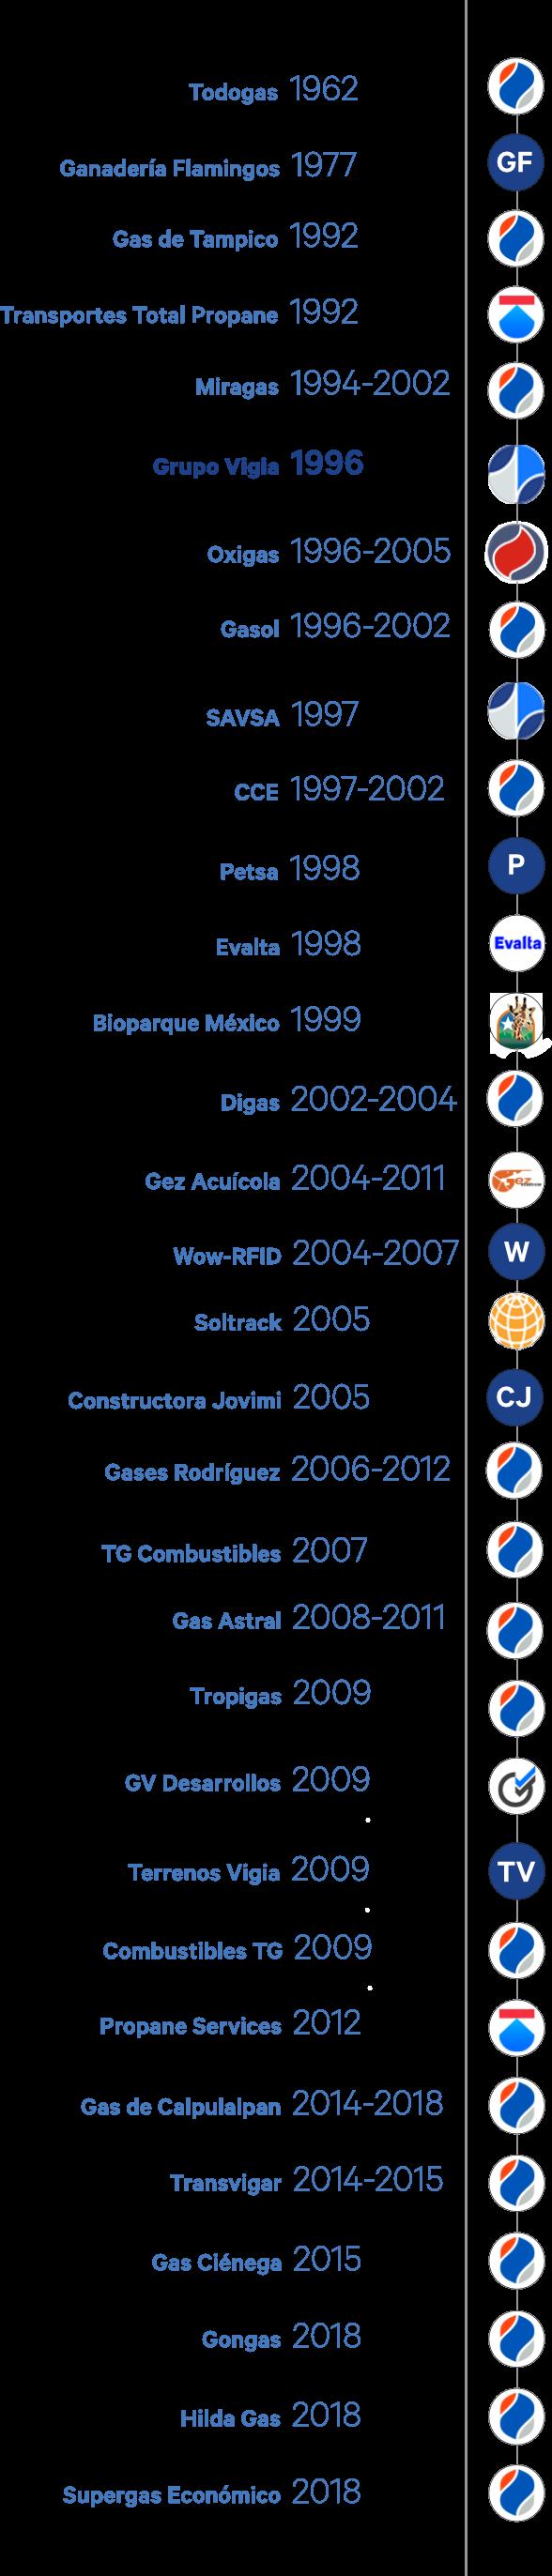 TimeLine Historia Vigia 1 .png